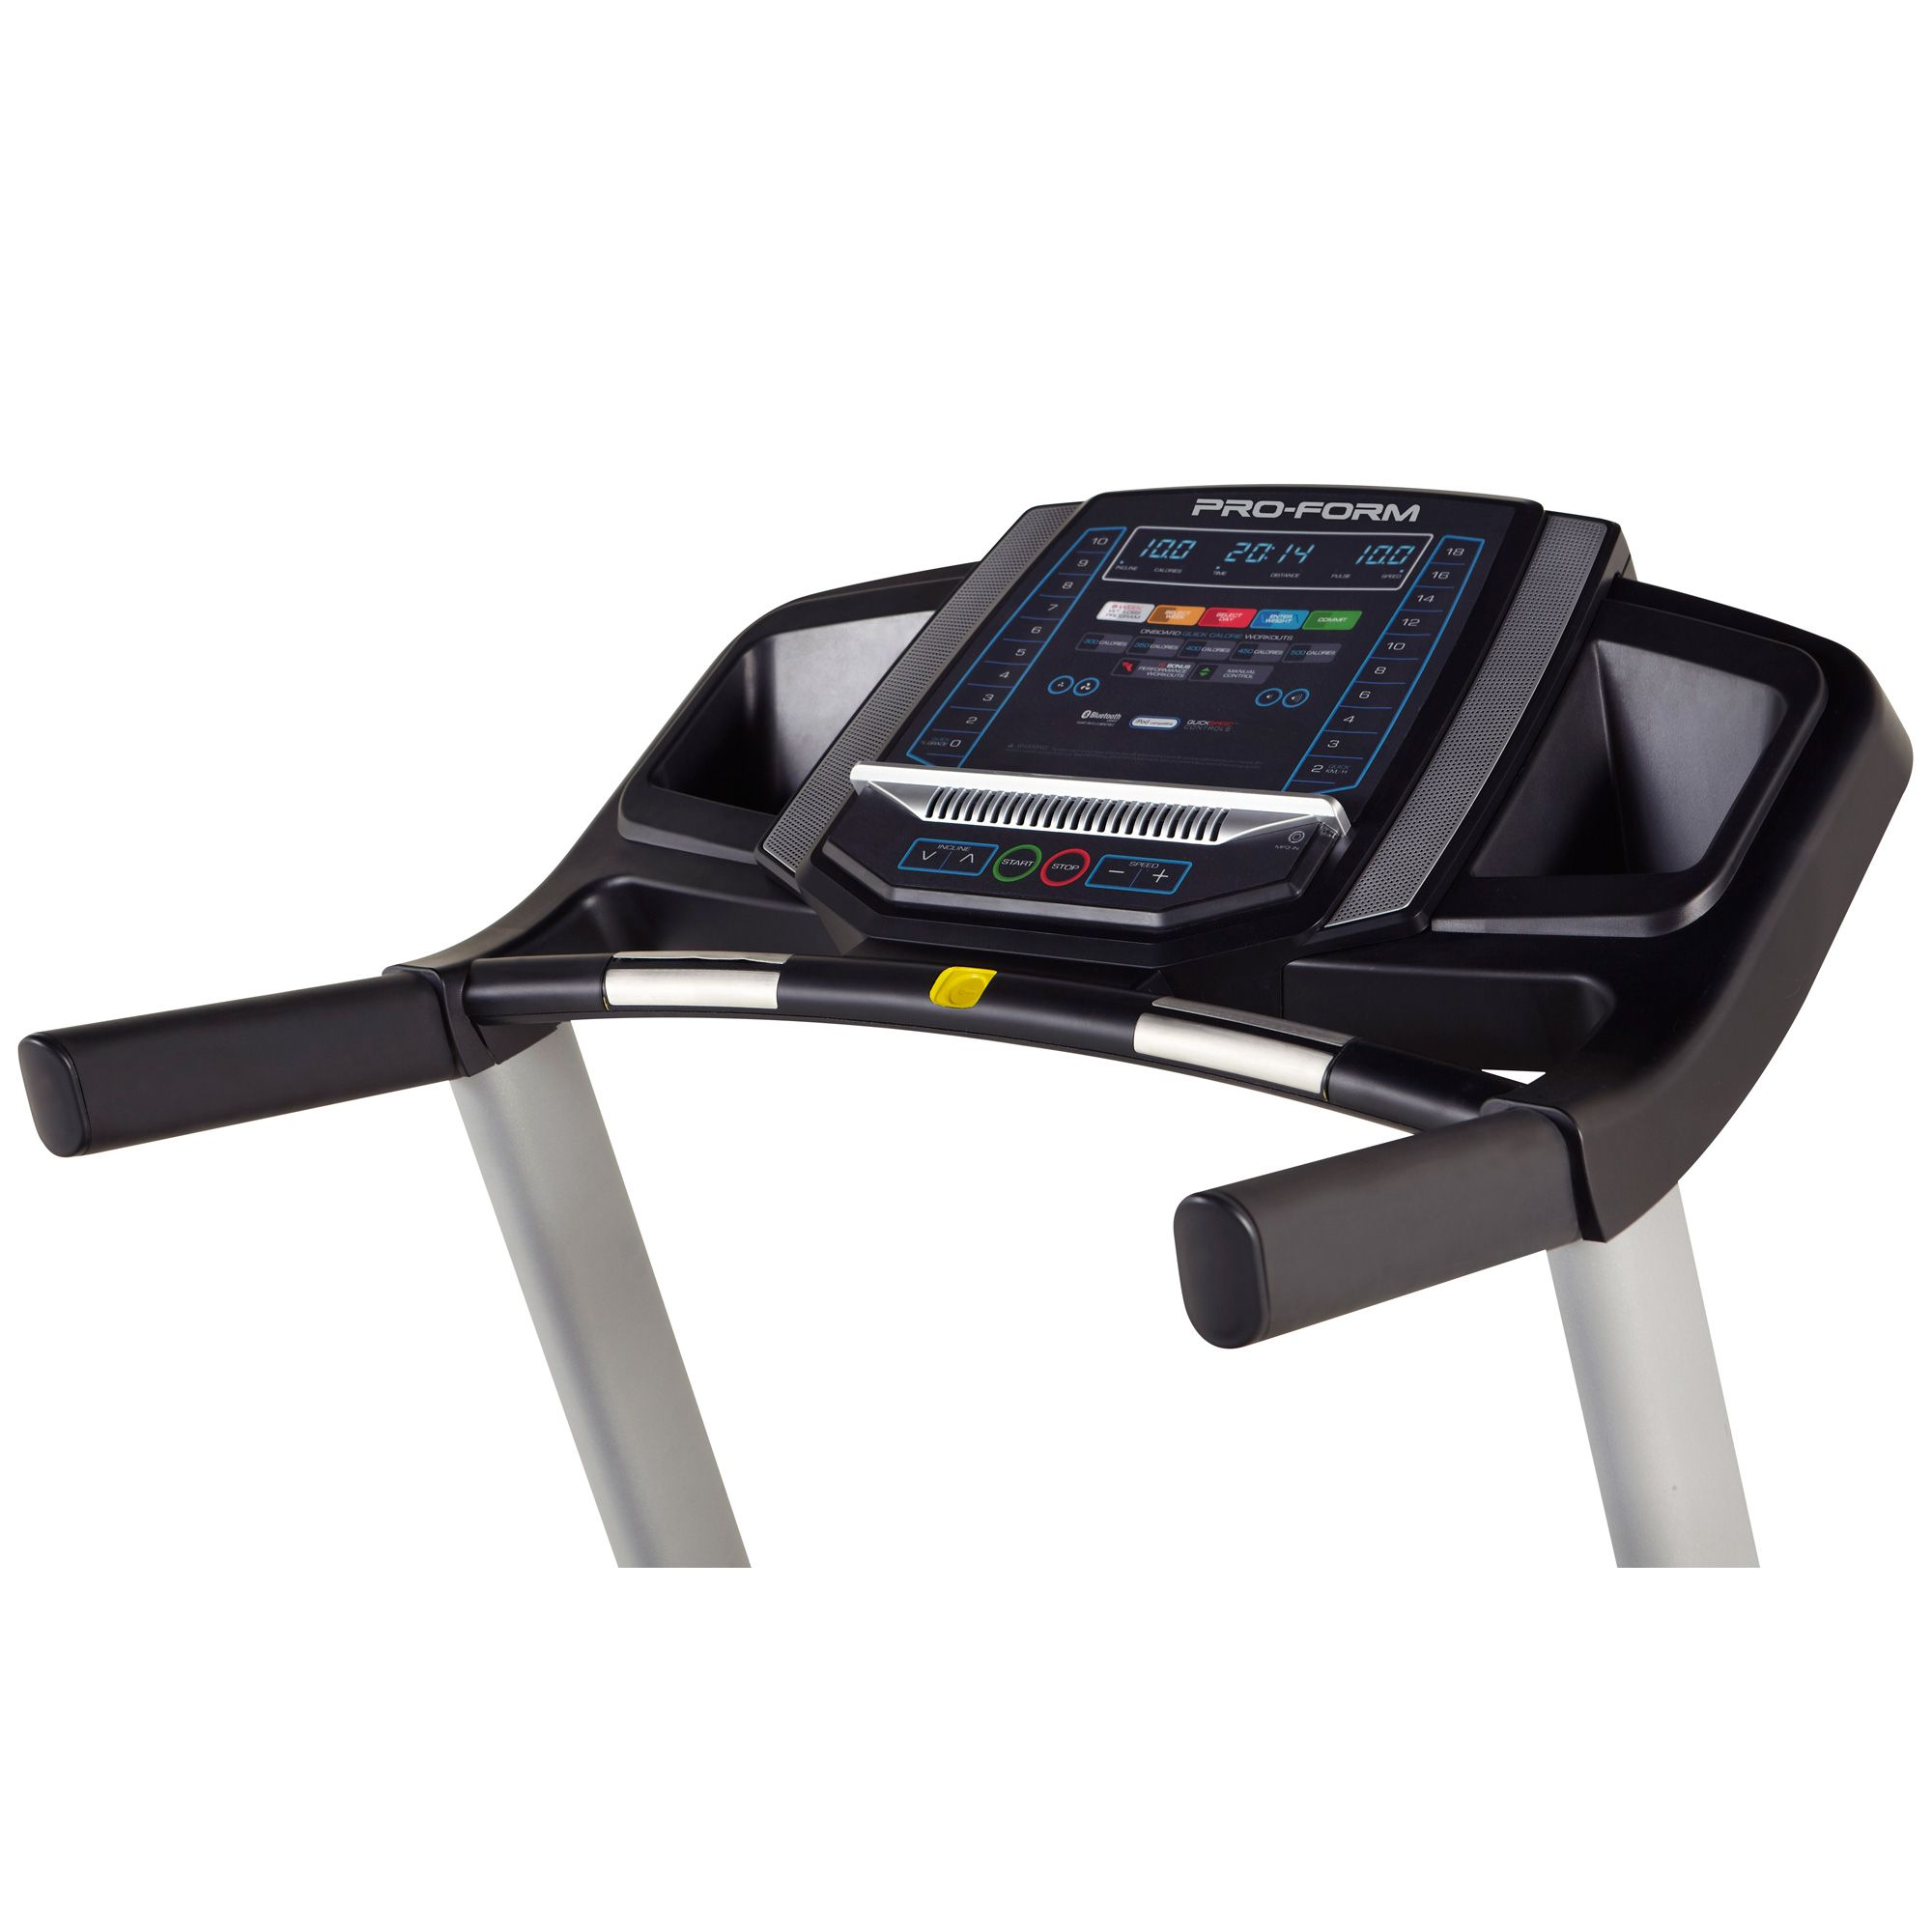 proform endurance s7 5 treadmill. Black Bedroom Furniture Sets. Home Design Ideas